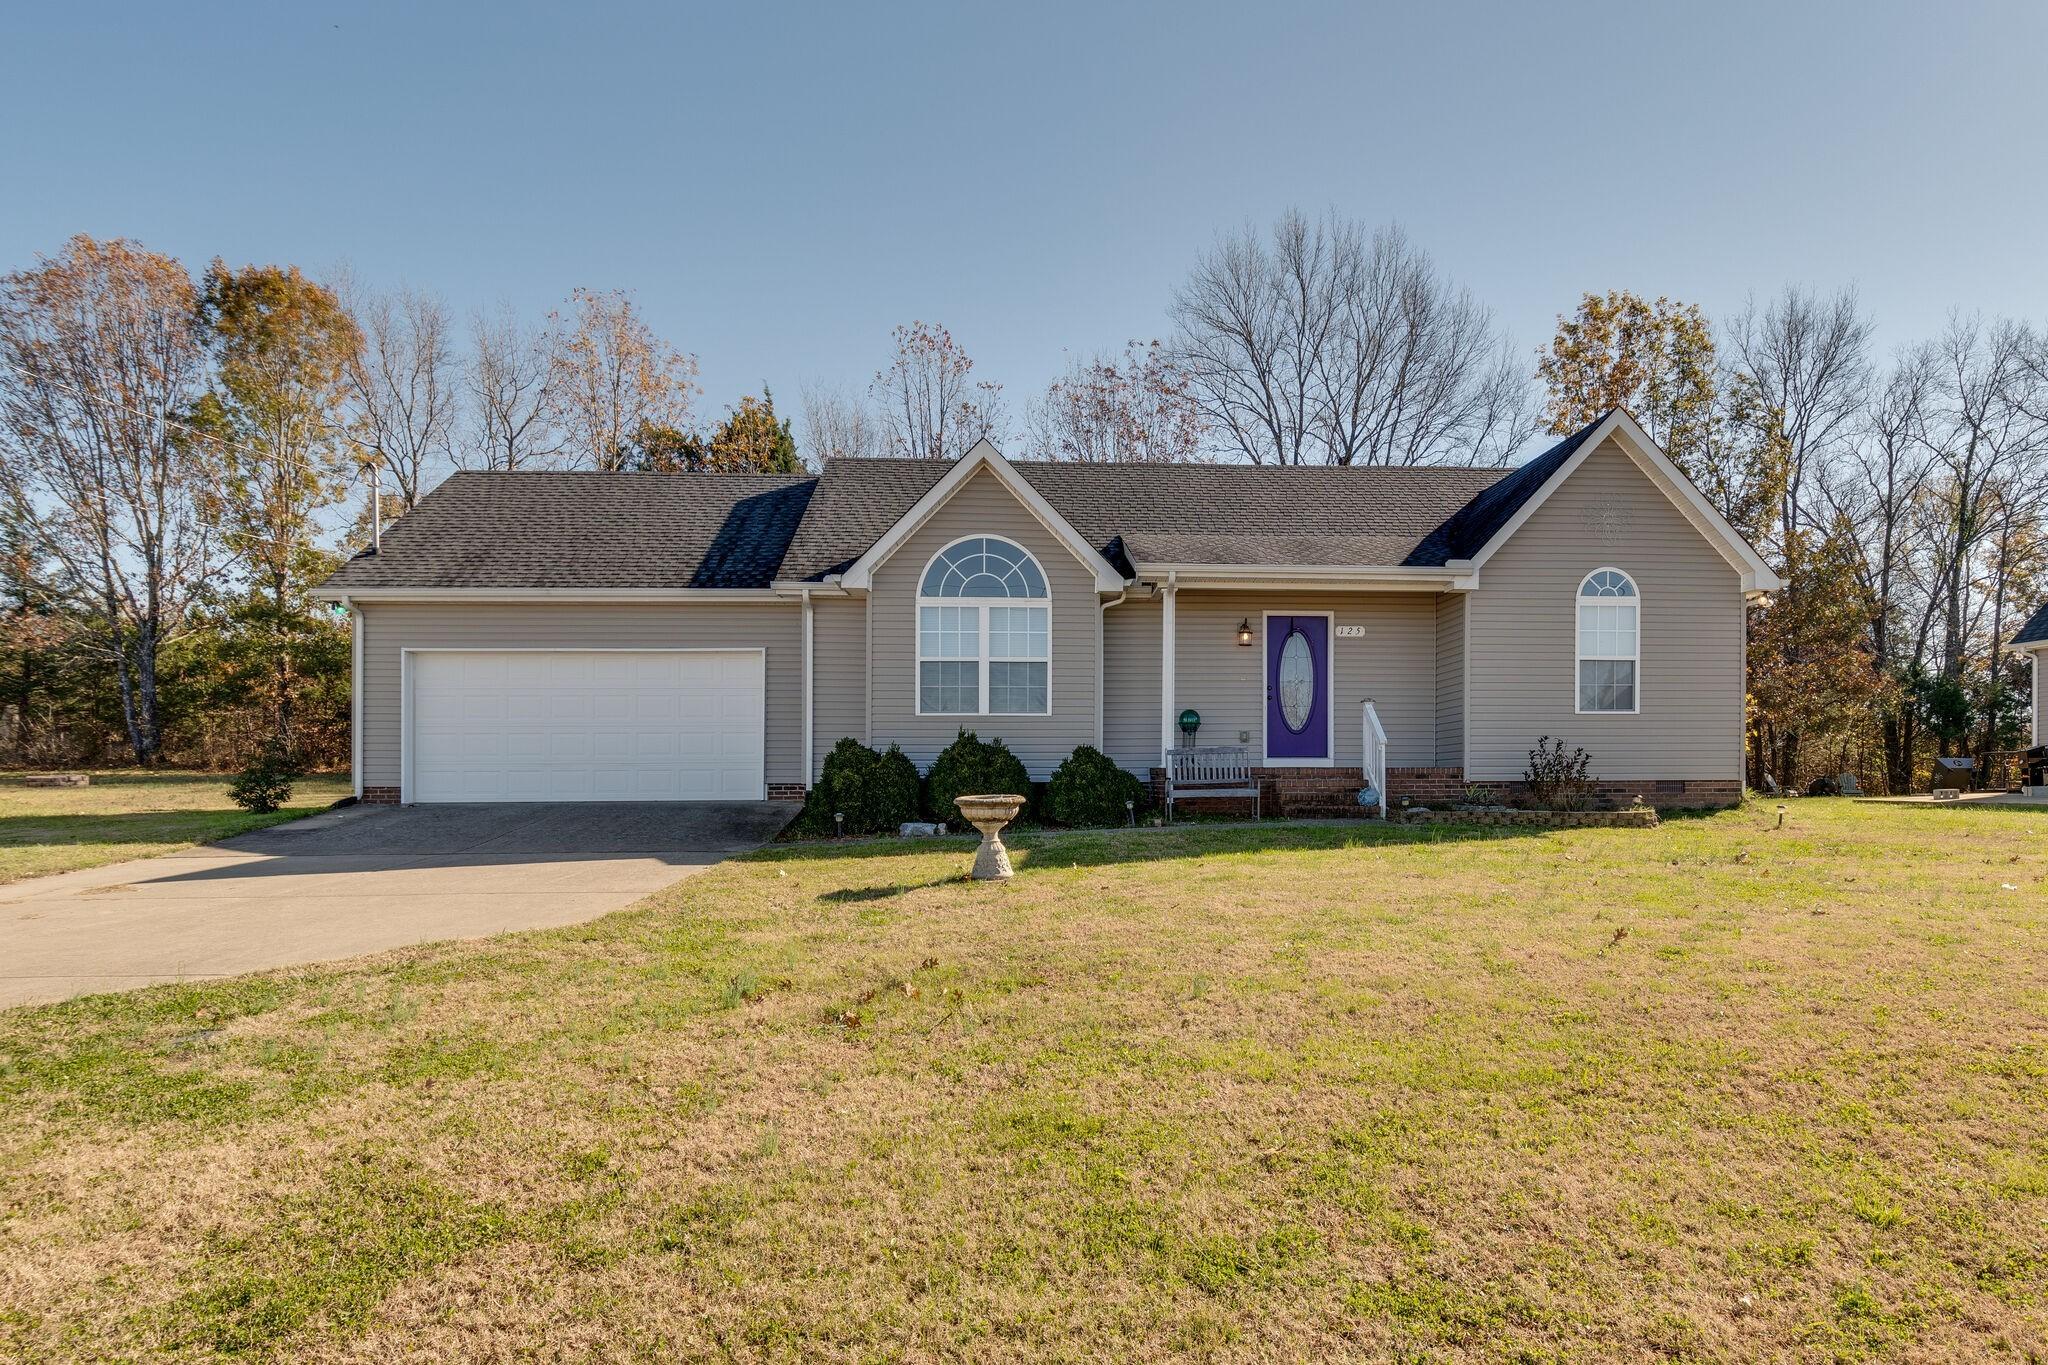 125 Moriah Ave Property Photo - Lewisburg, TN real estate listing